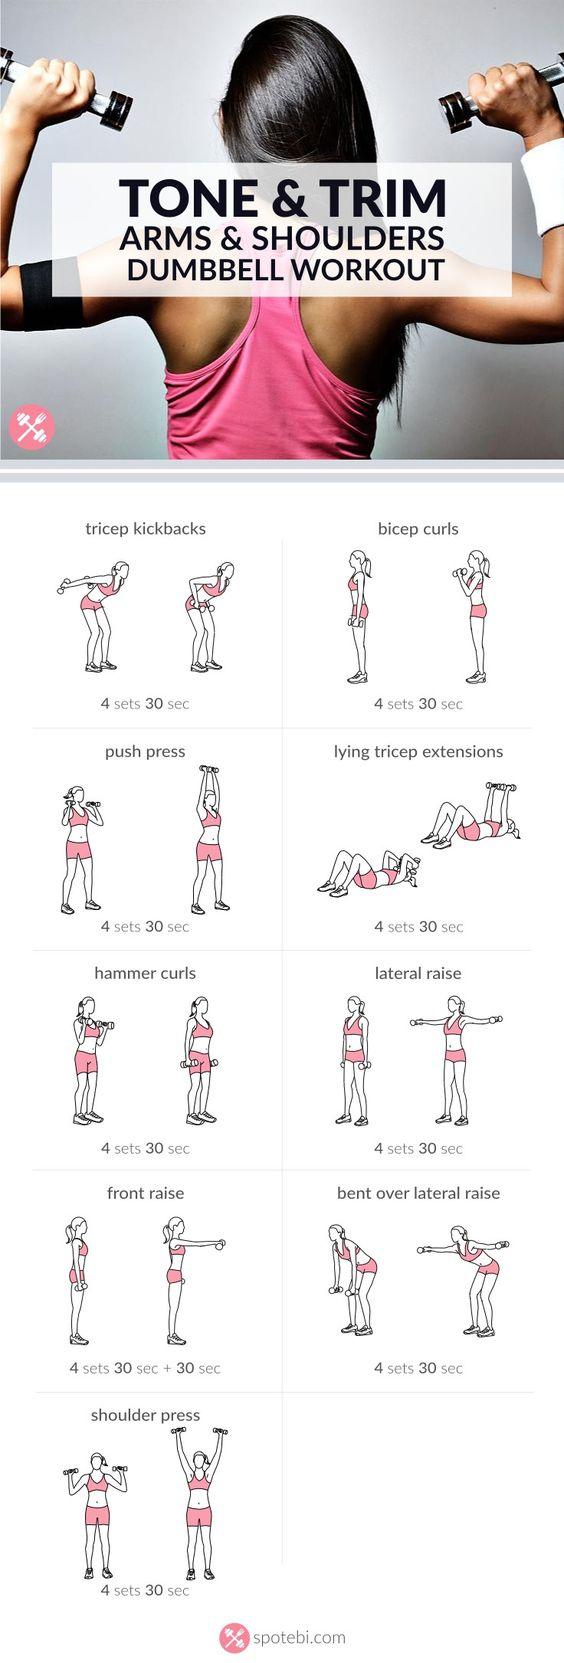 Arm Workouts Women: 23 Fat Burning Bikini Arm Workouts That Will Shape Your